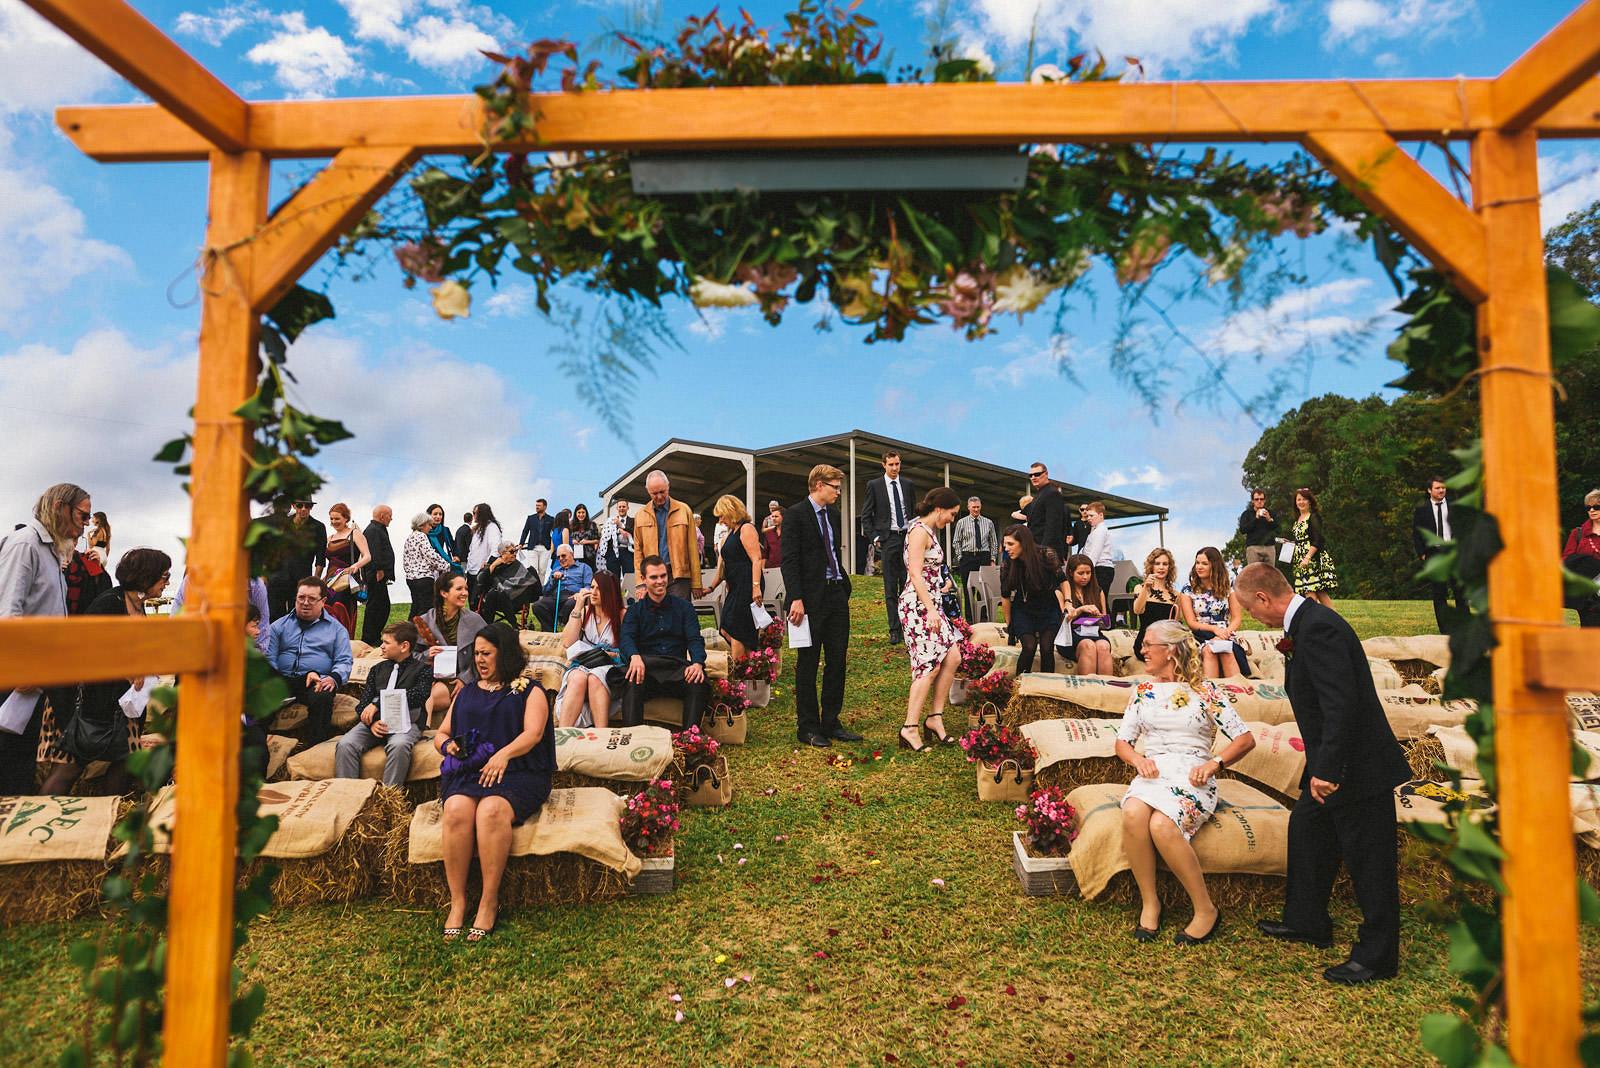 tablelands_wedding_0012